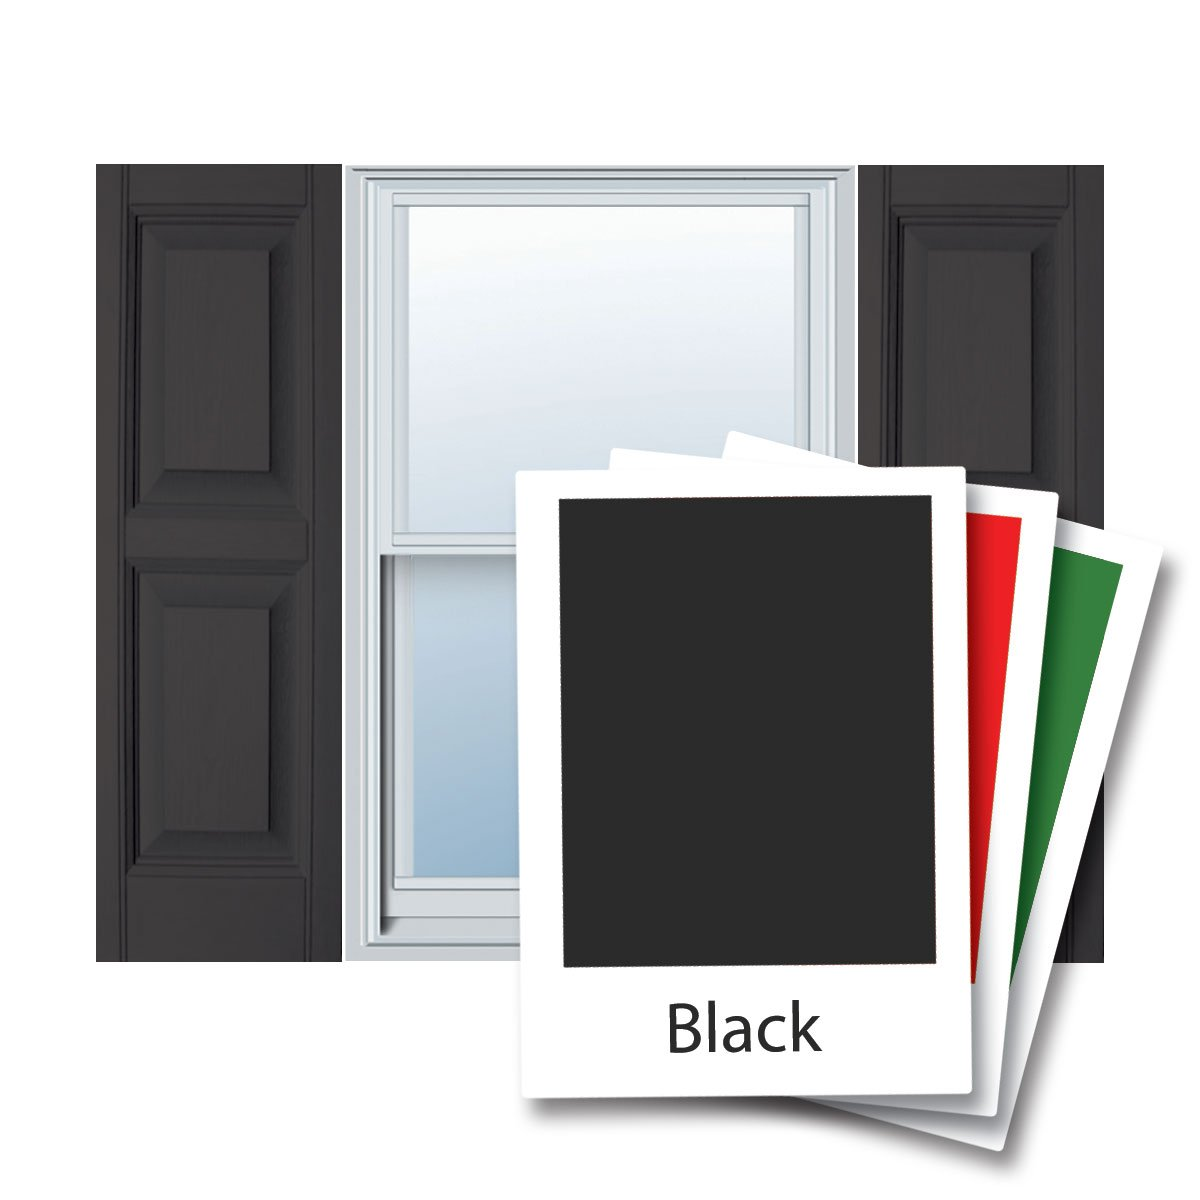 12'' x 59'' Builders Choice Vinyl Raised Panel Window Shutters, w/Shutter Spikes & Screws (Per Pair), Black